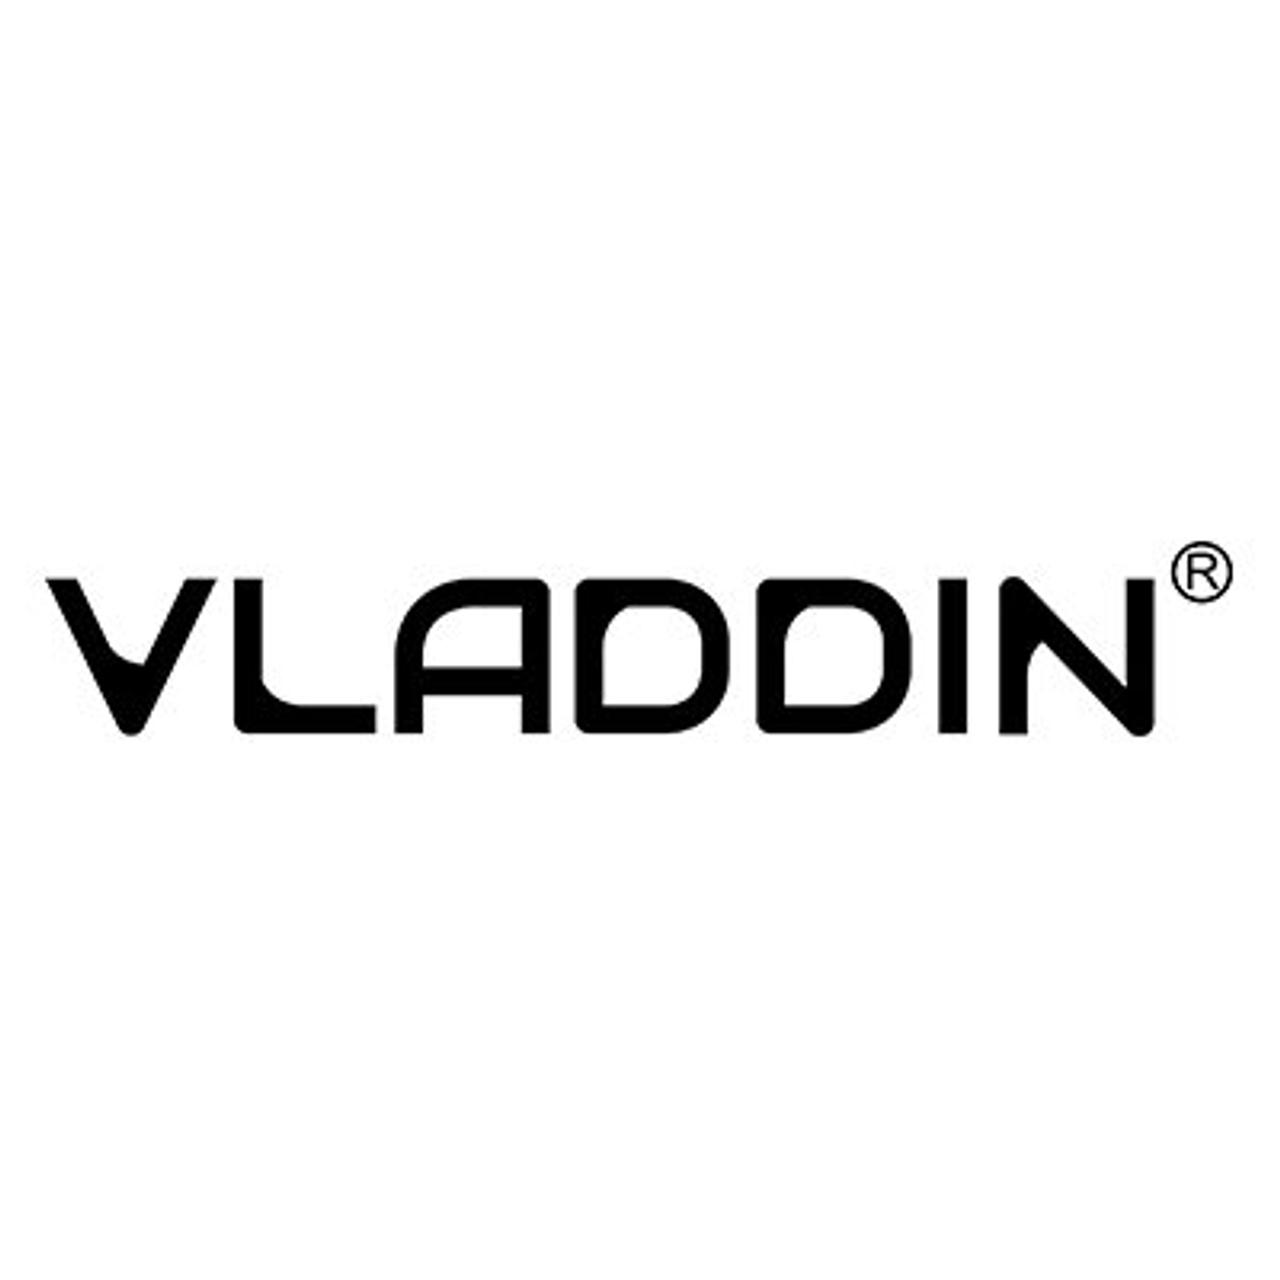 Vladdin